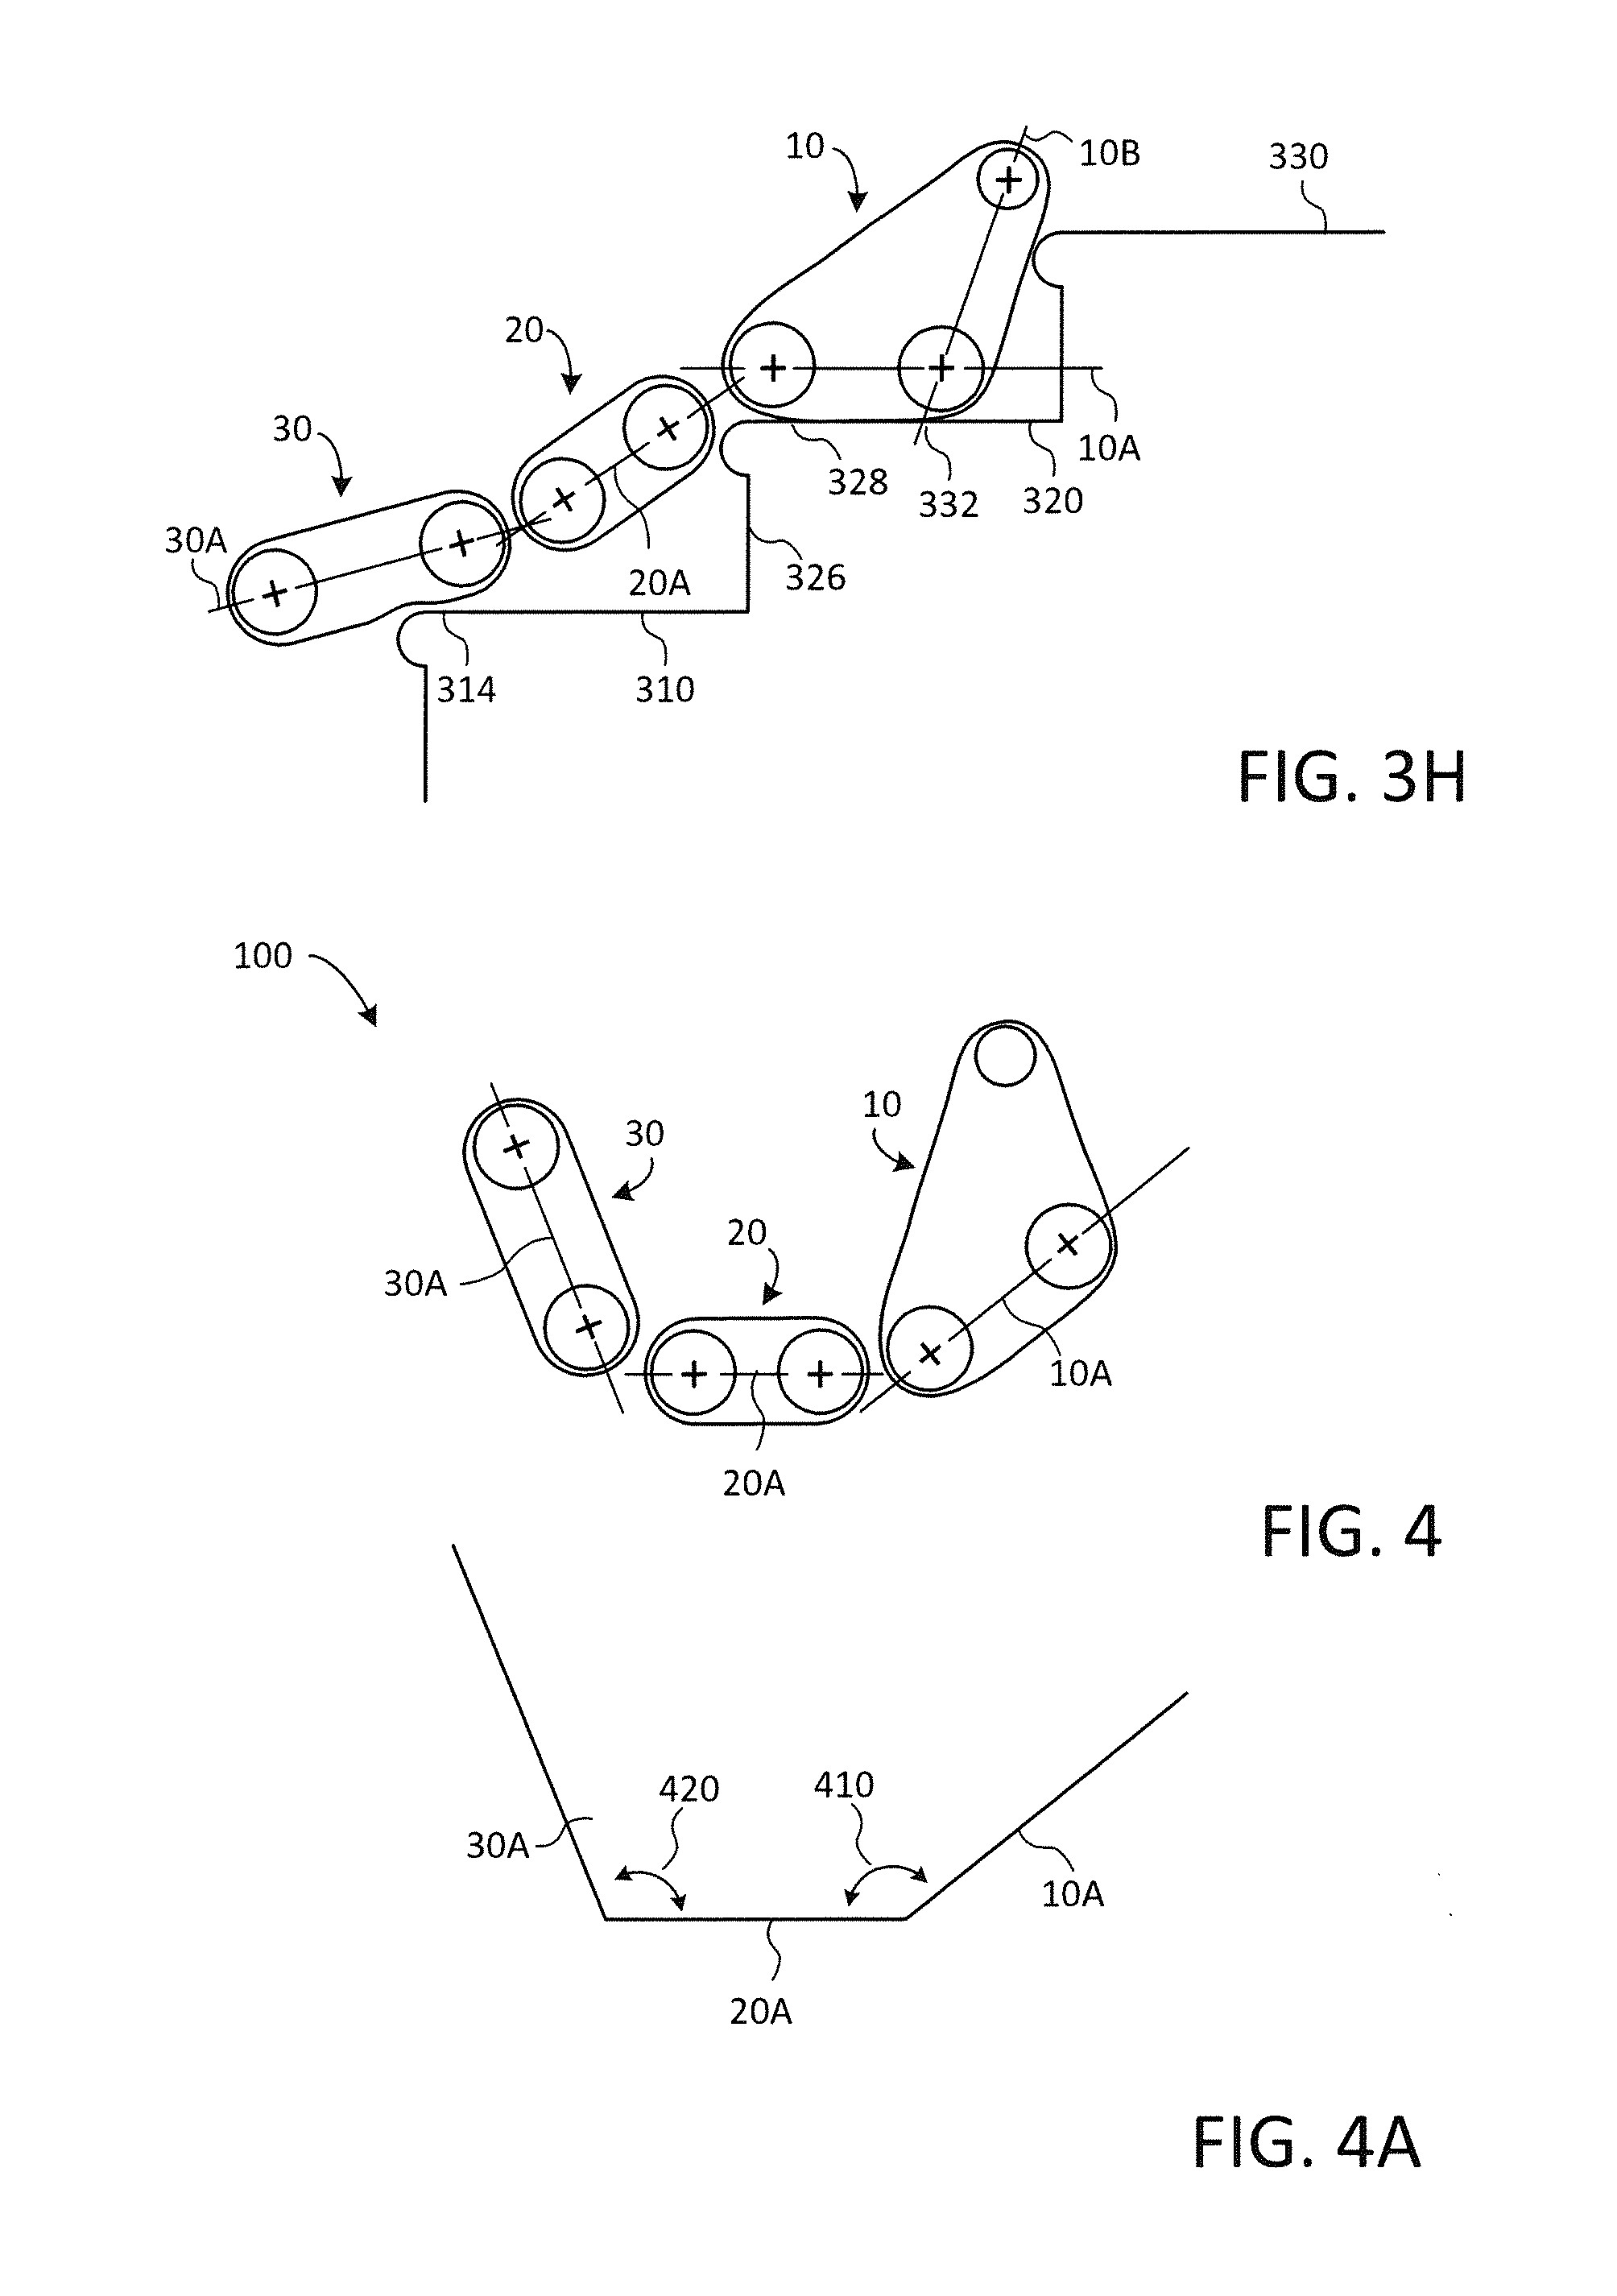 john deere x500 wiring diagram moreover john deere lx188 parts